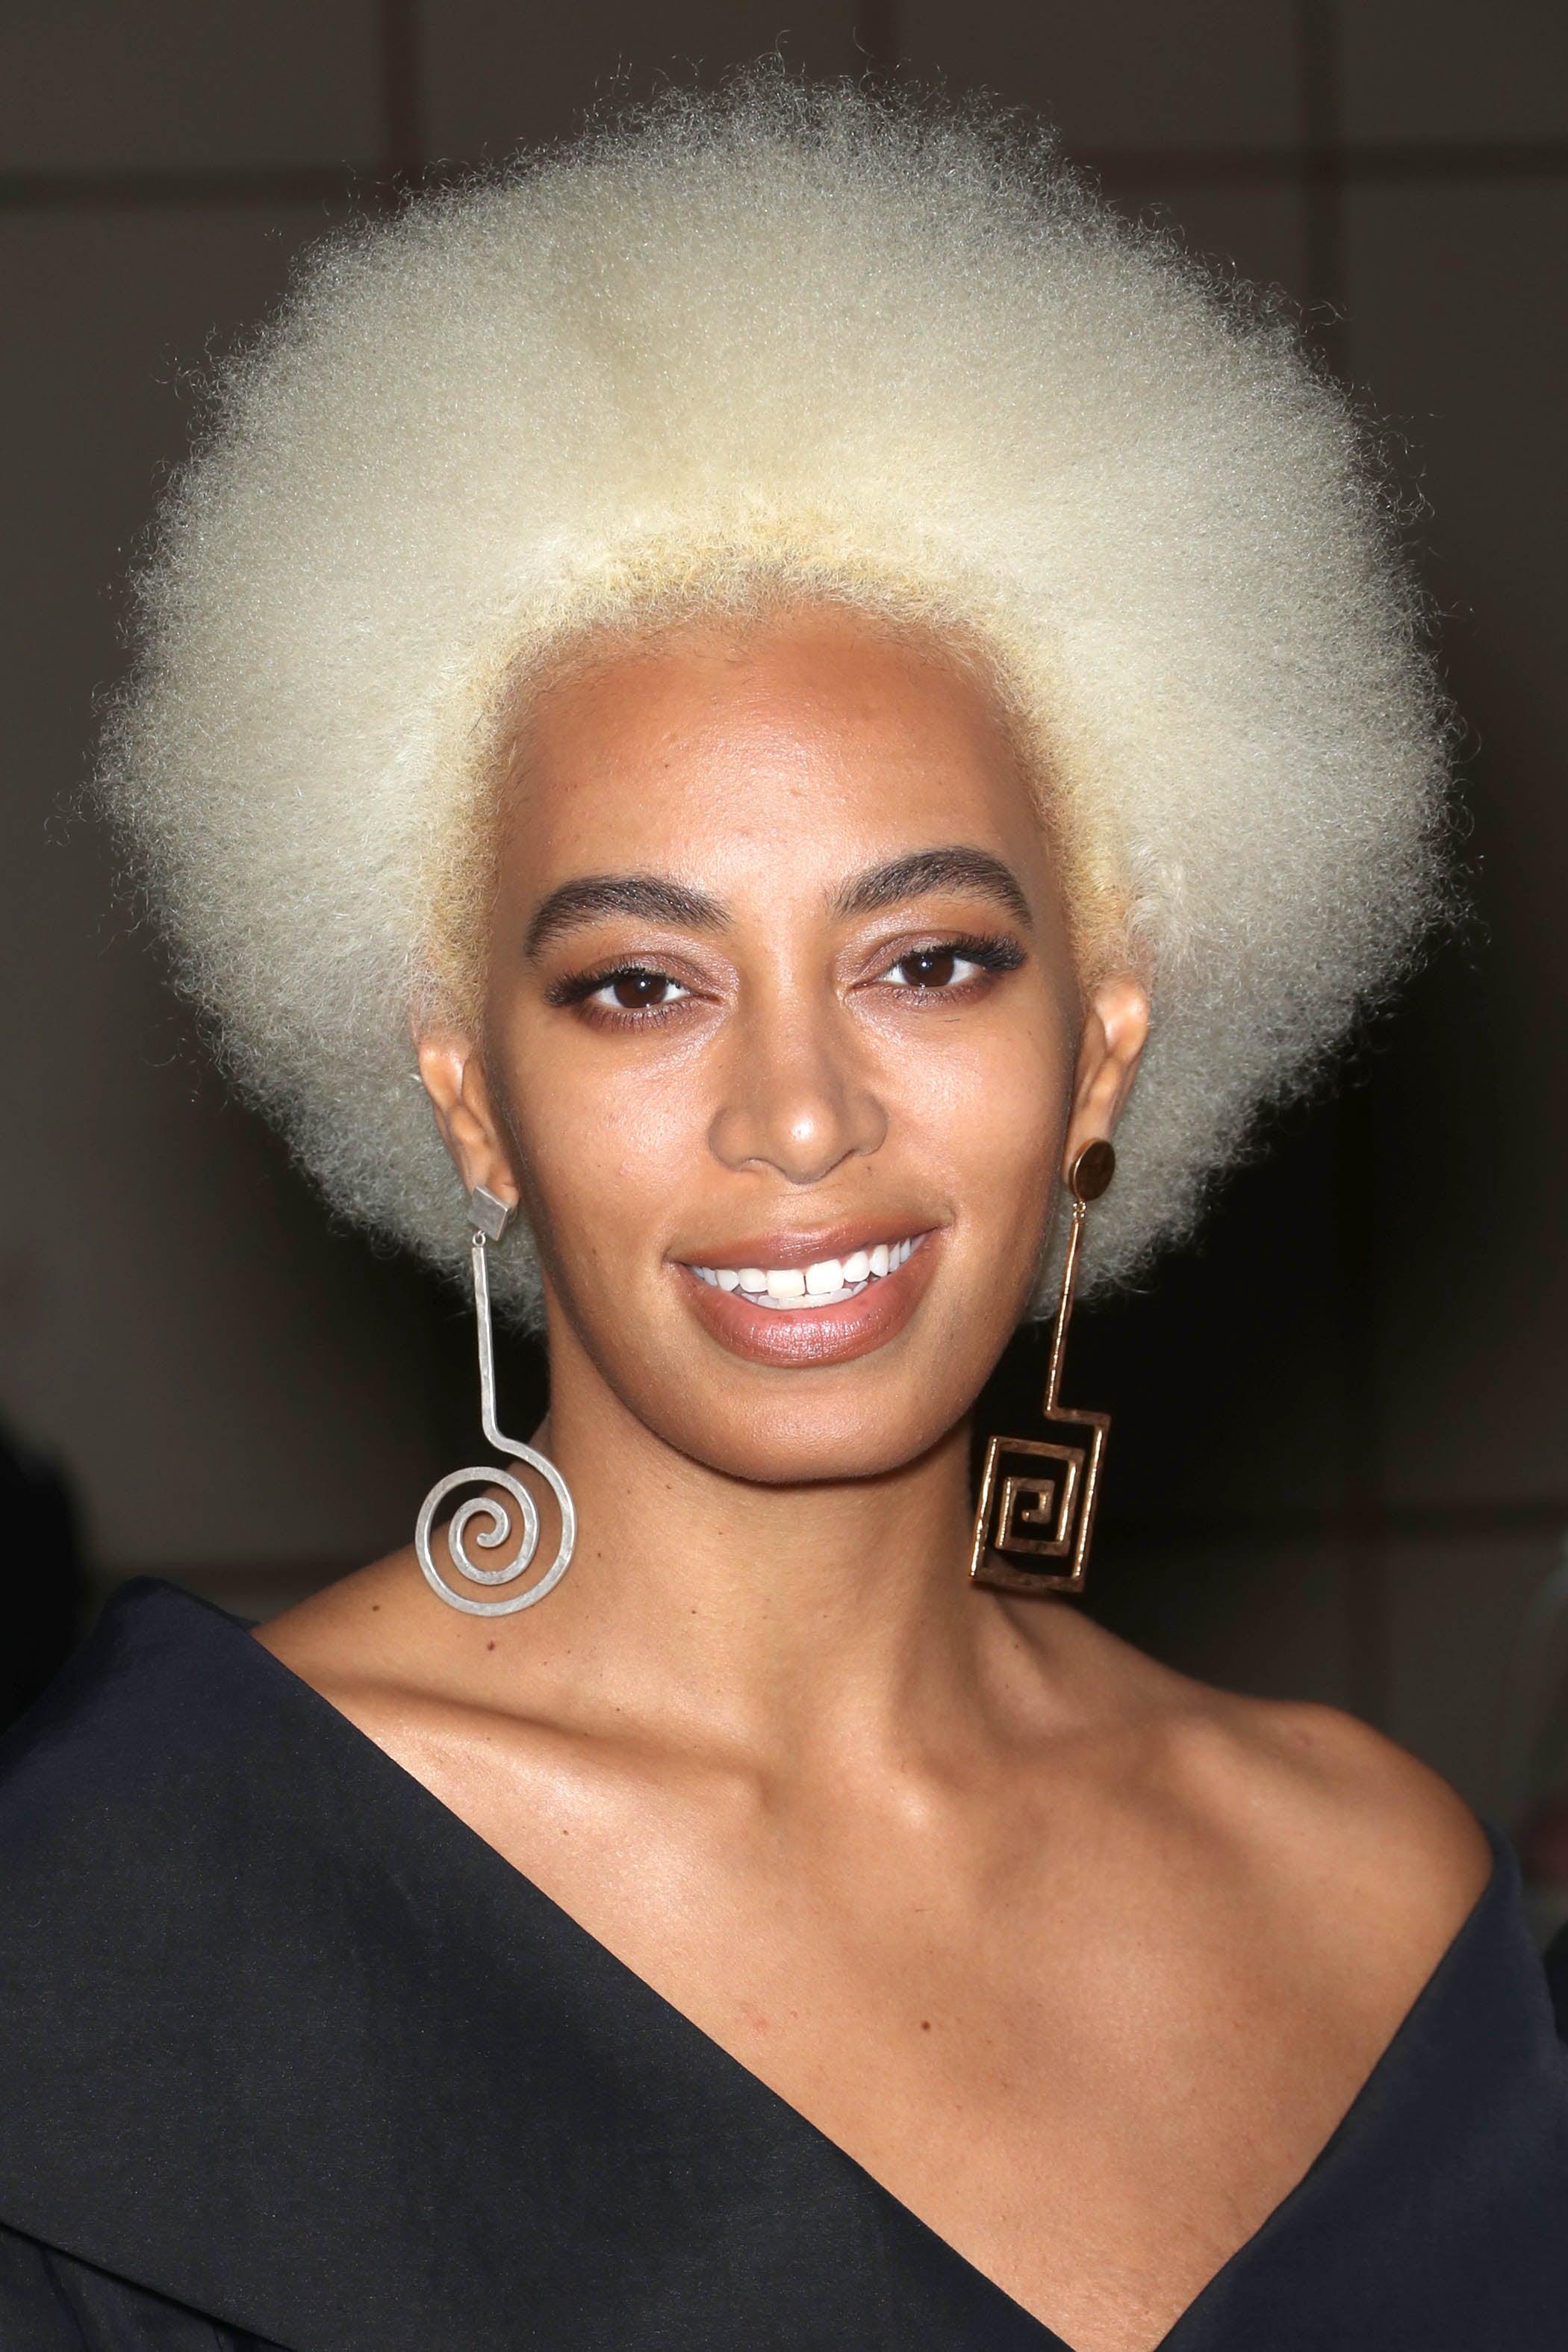 Black Girl Short Blonde Hairstyles | RLDM